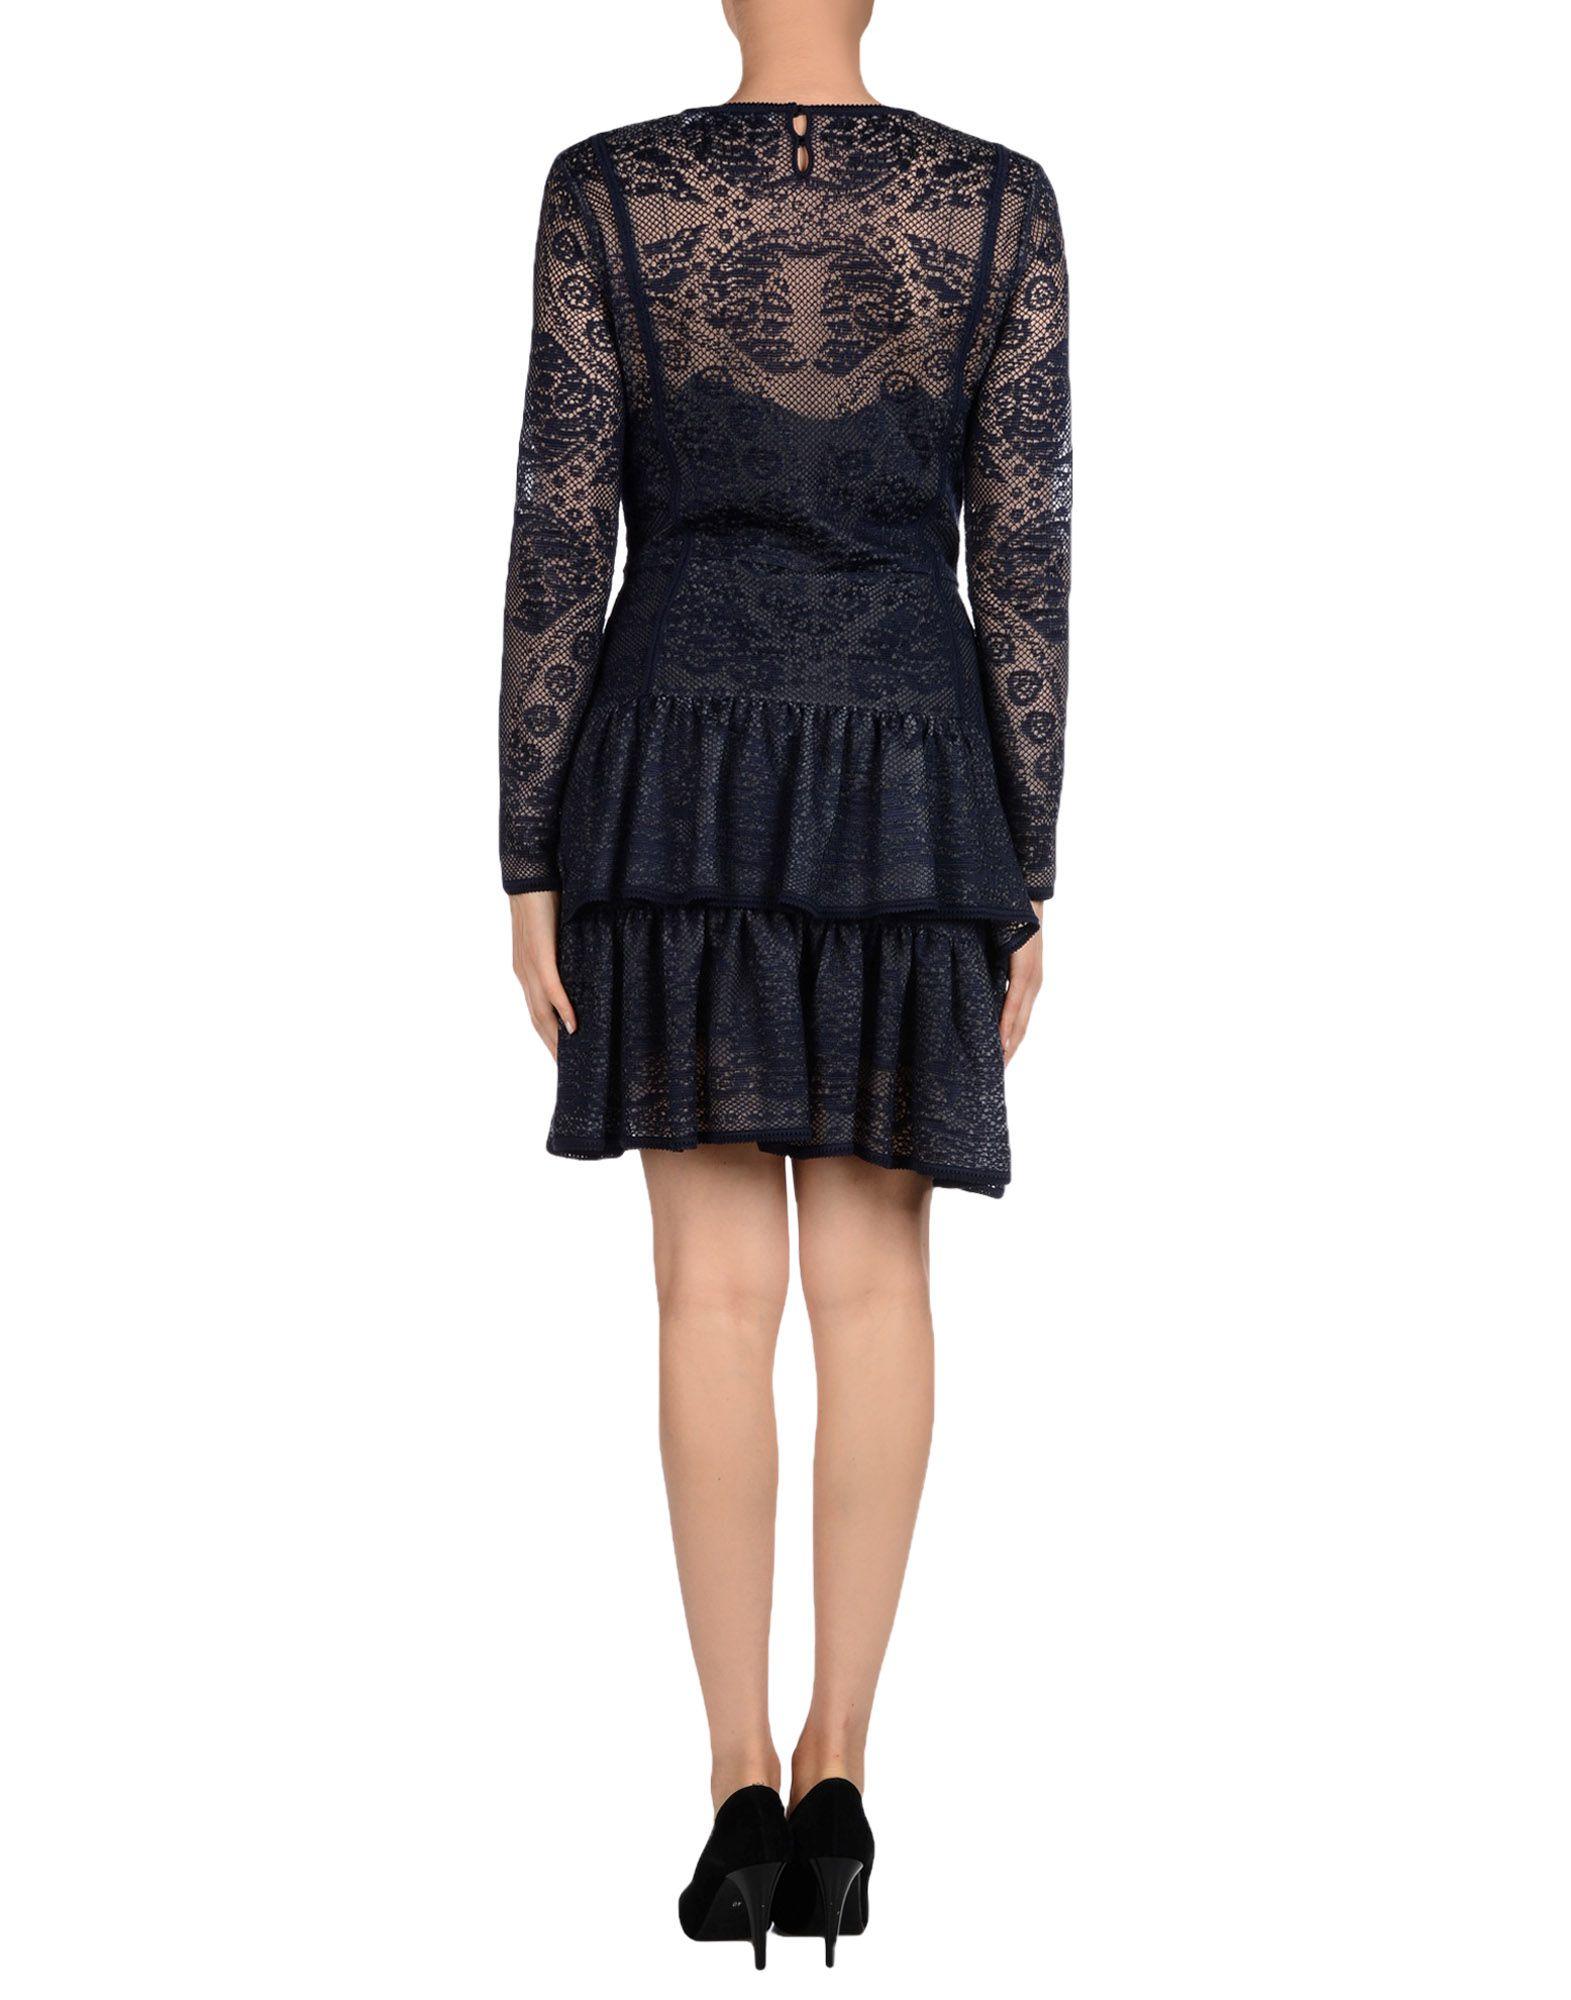 dior short dresses - photo #14